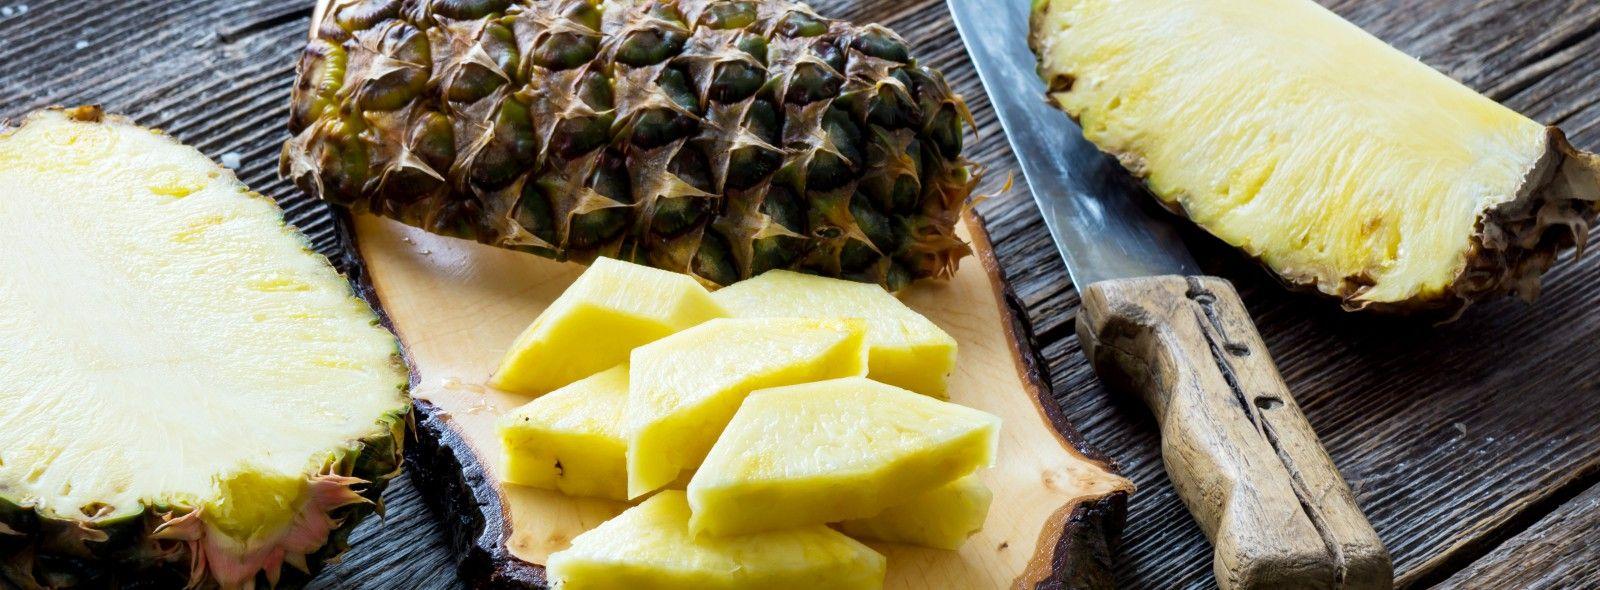 L'ananas fa dimagrire?